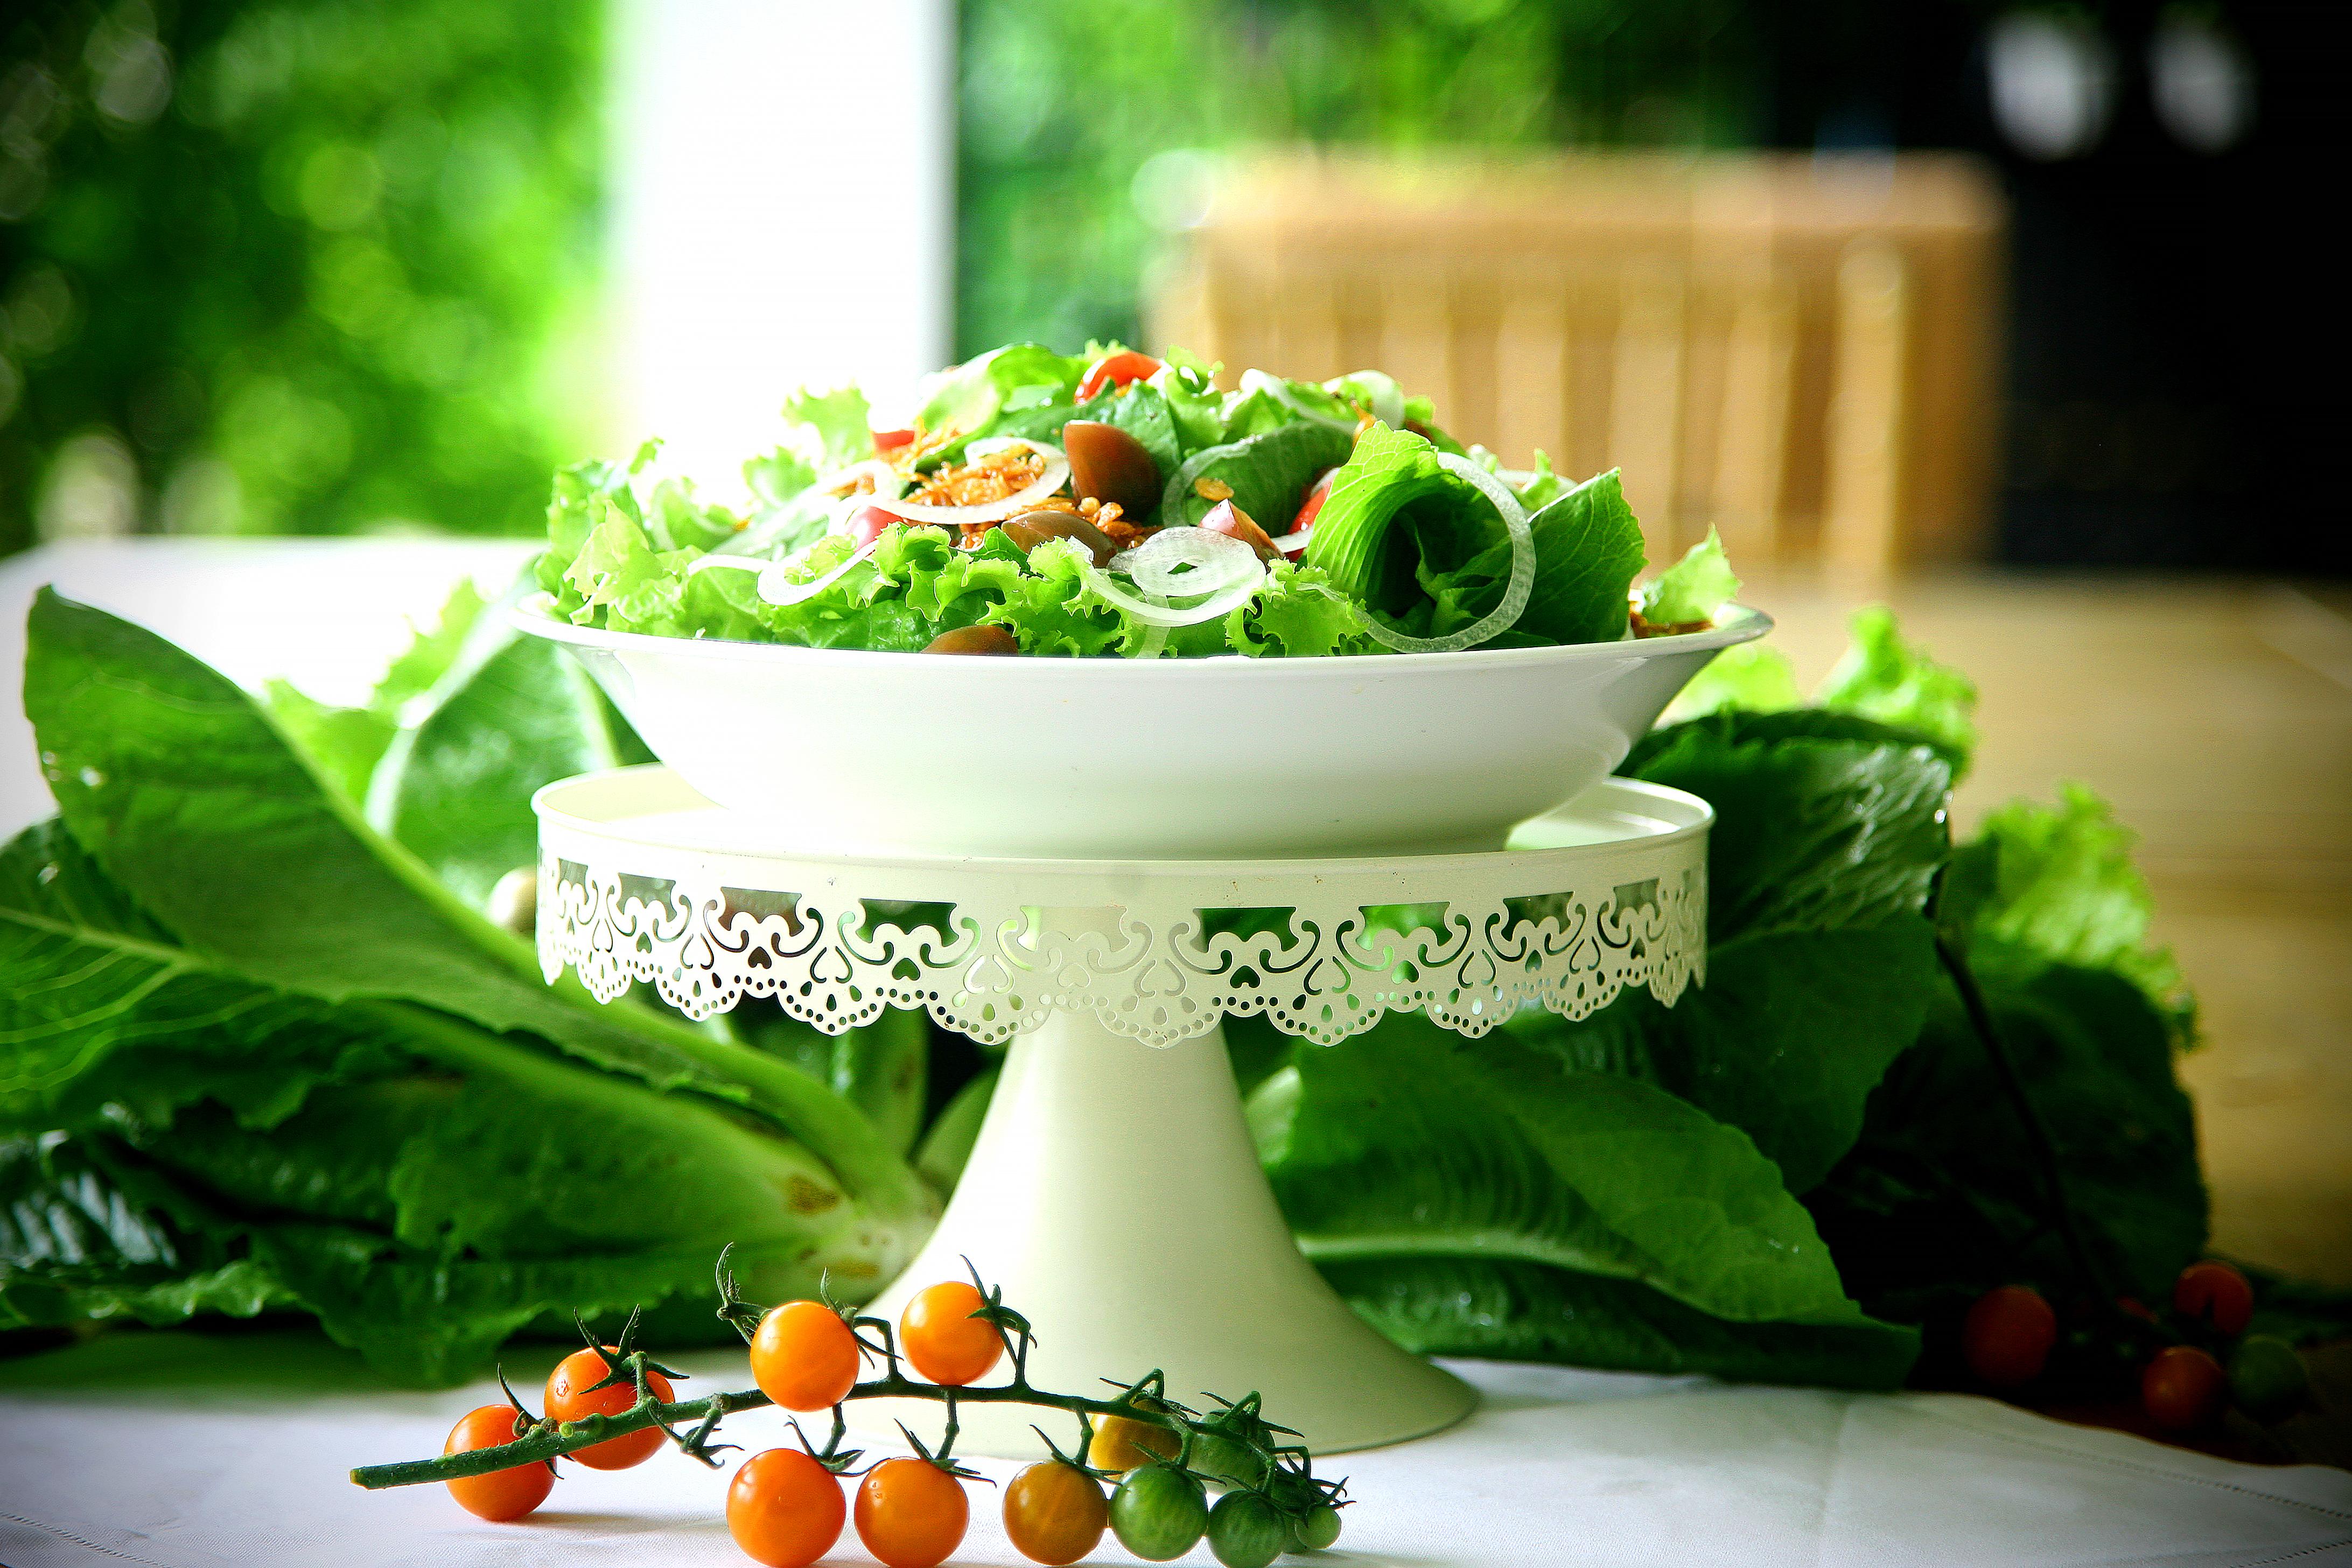 Salad Bình An